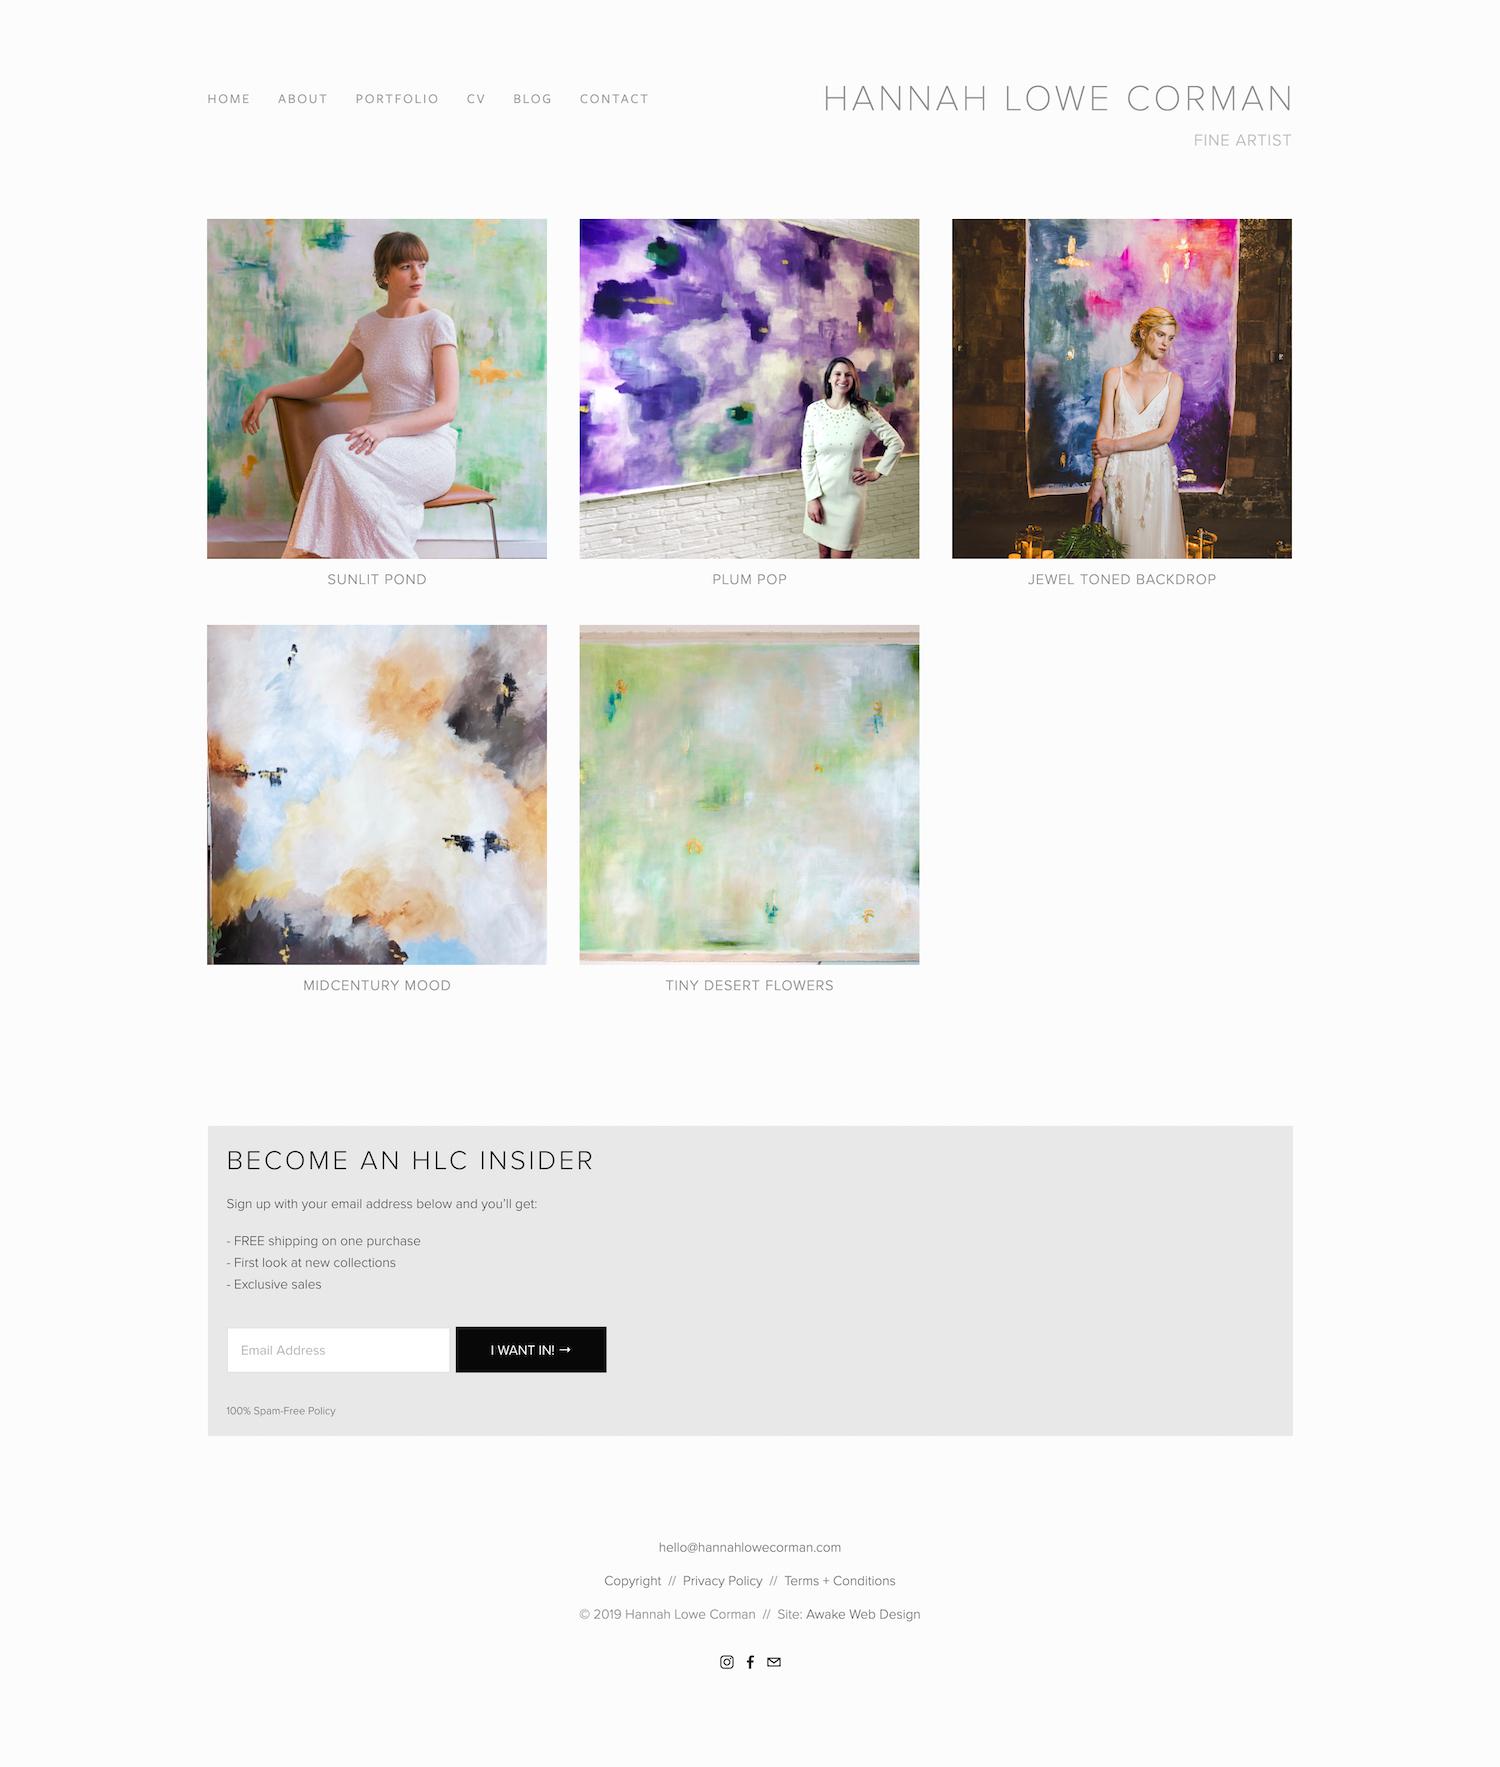 hannah-lowe-corman-awake-web-design-portfolio-5.jpg